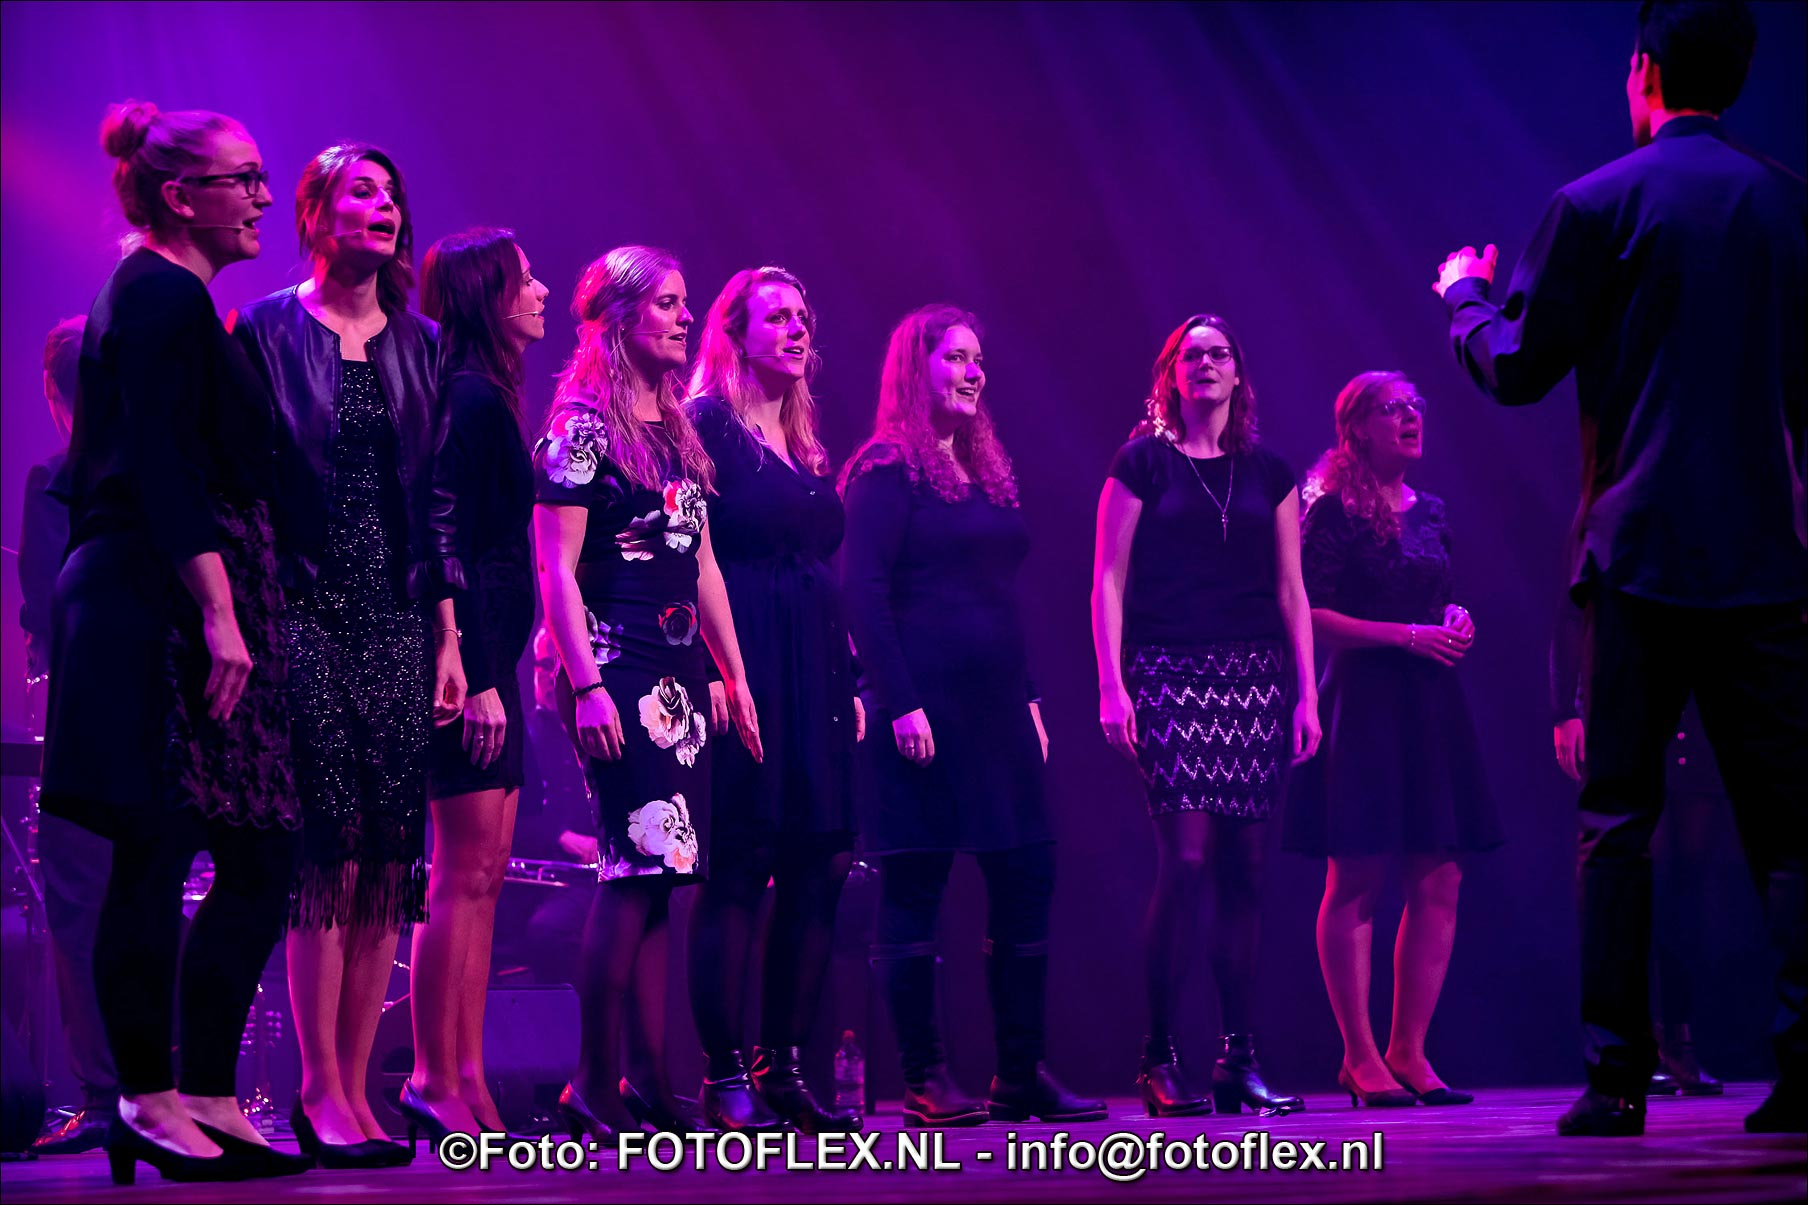 0397-CopyrightFOTOFLEX.NL07012020